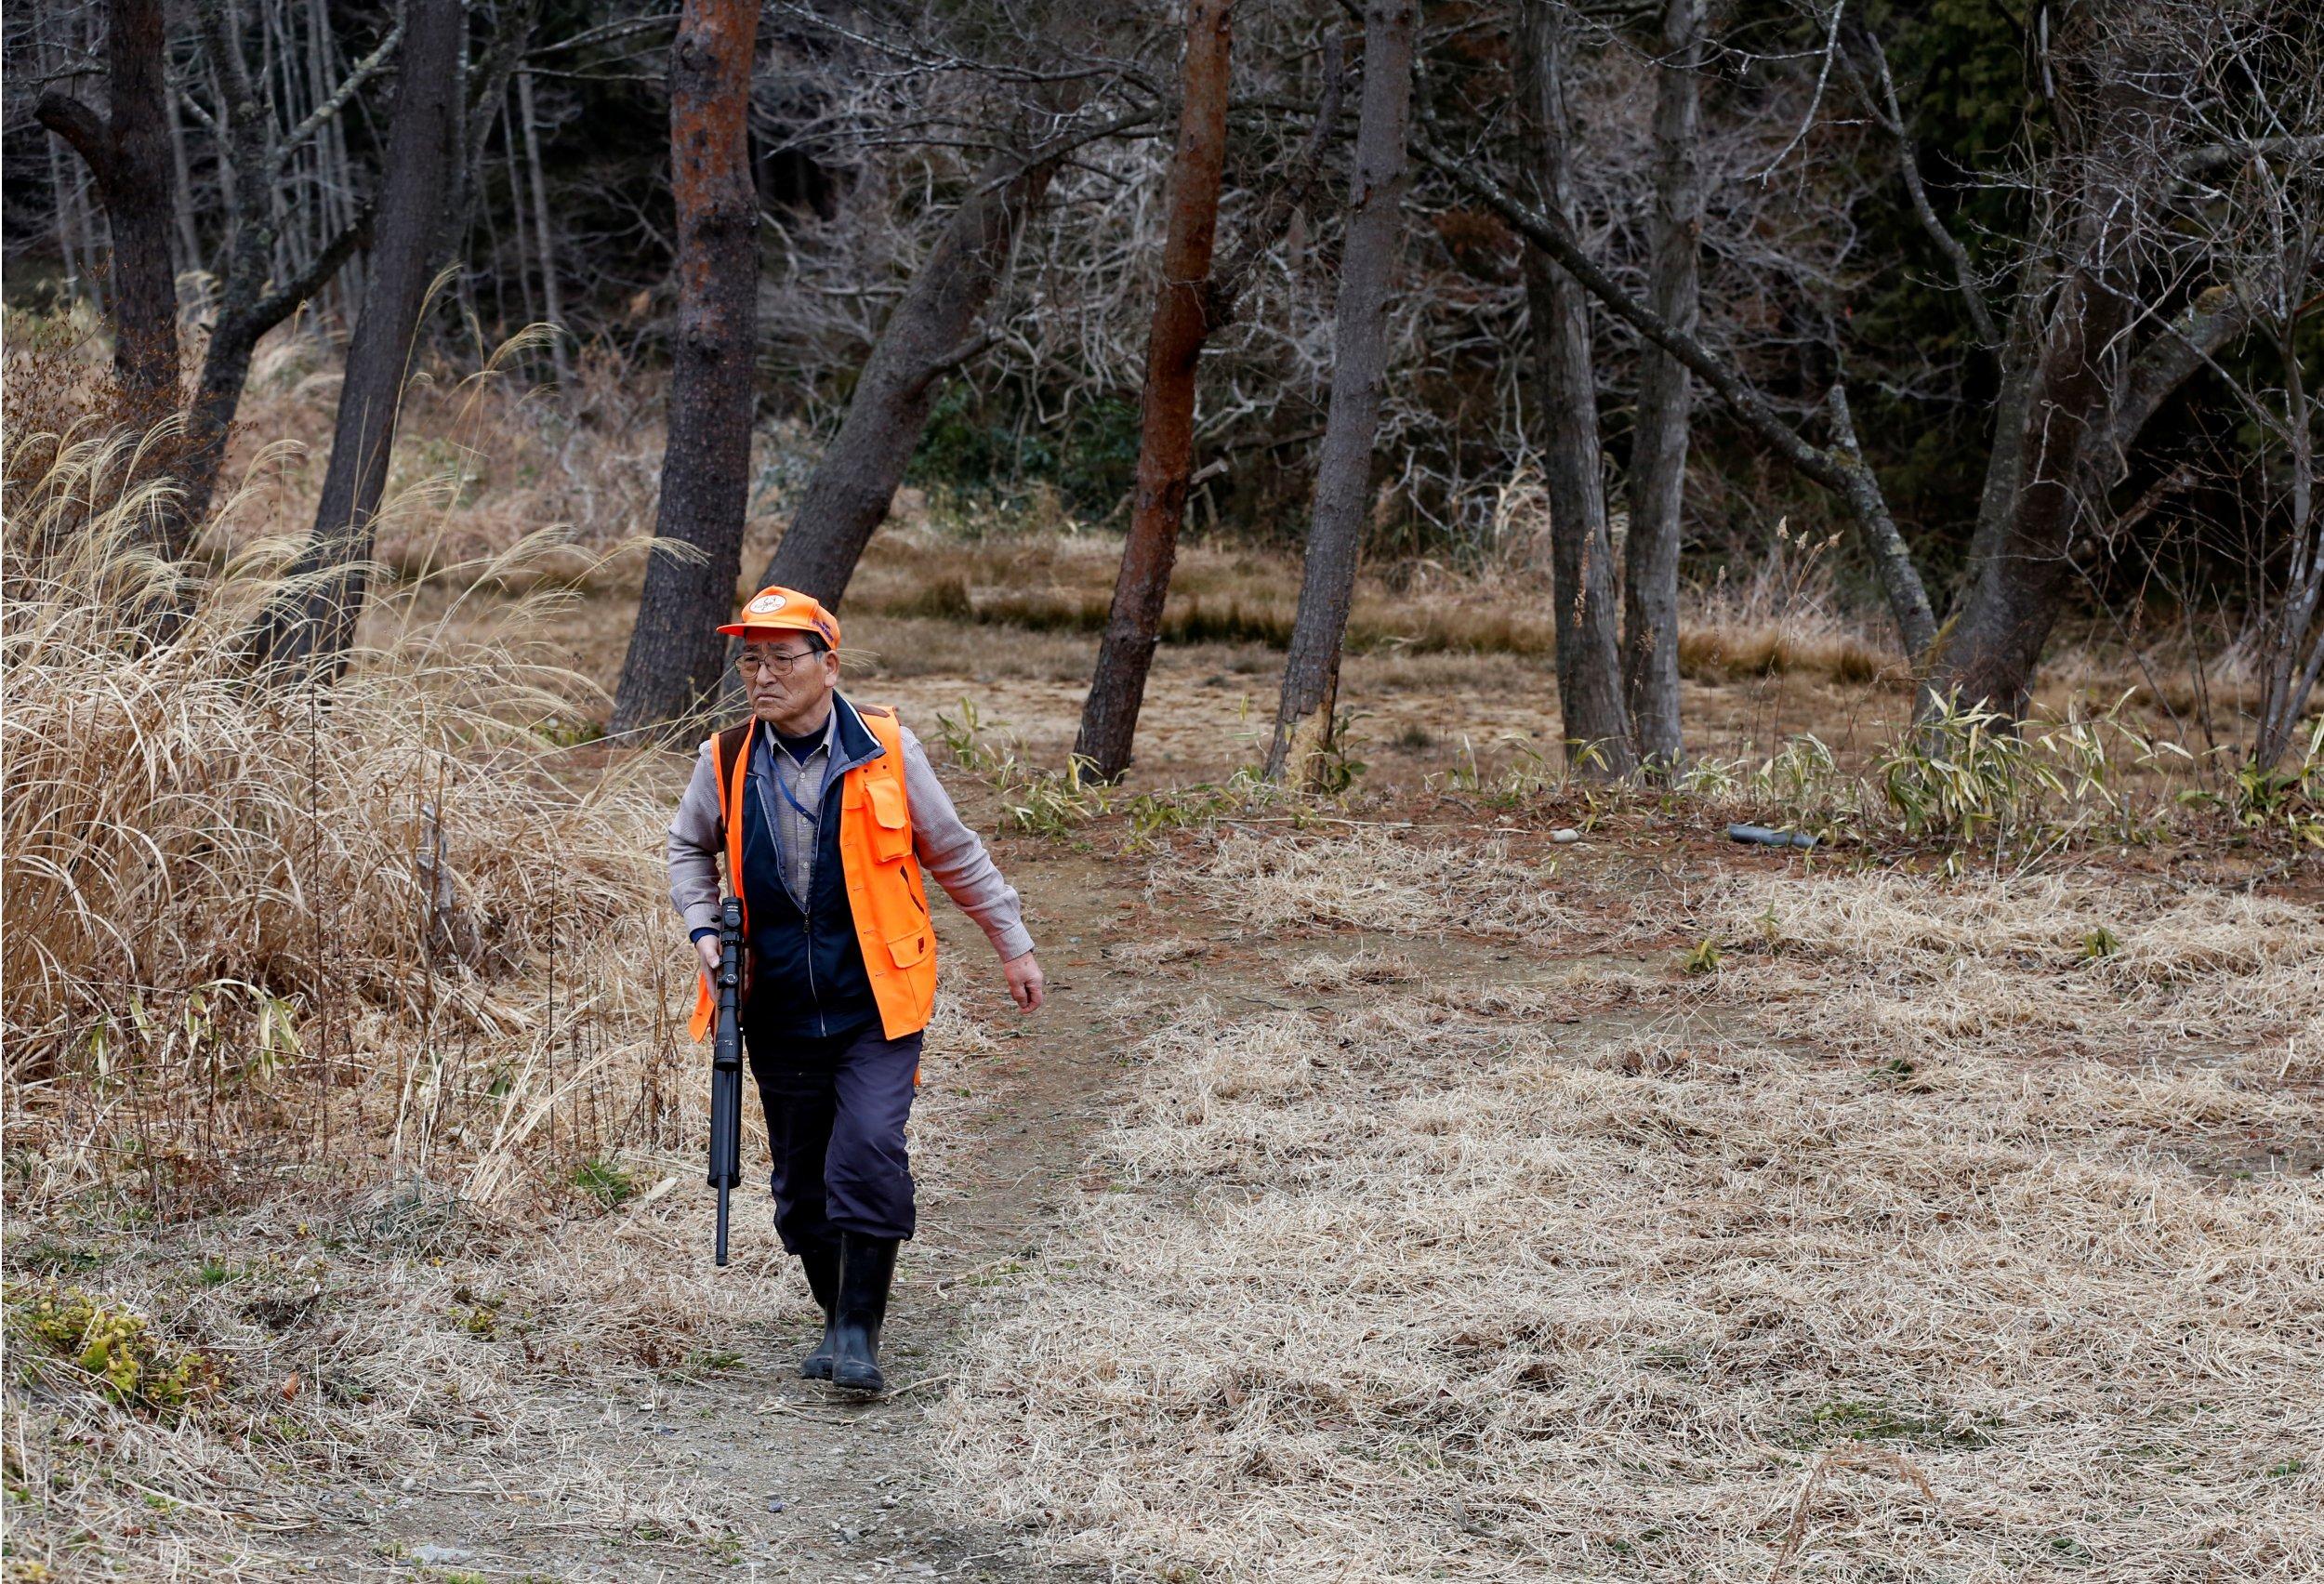 Man hunts wild boars in Fukushima